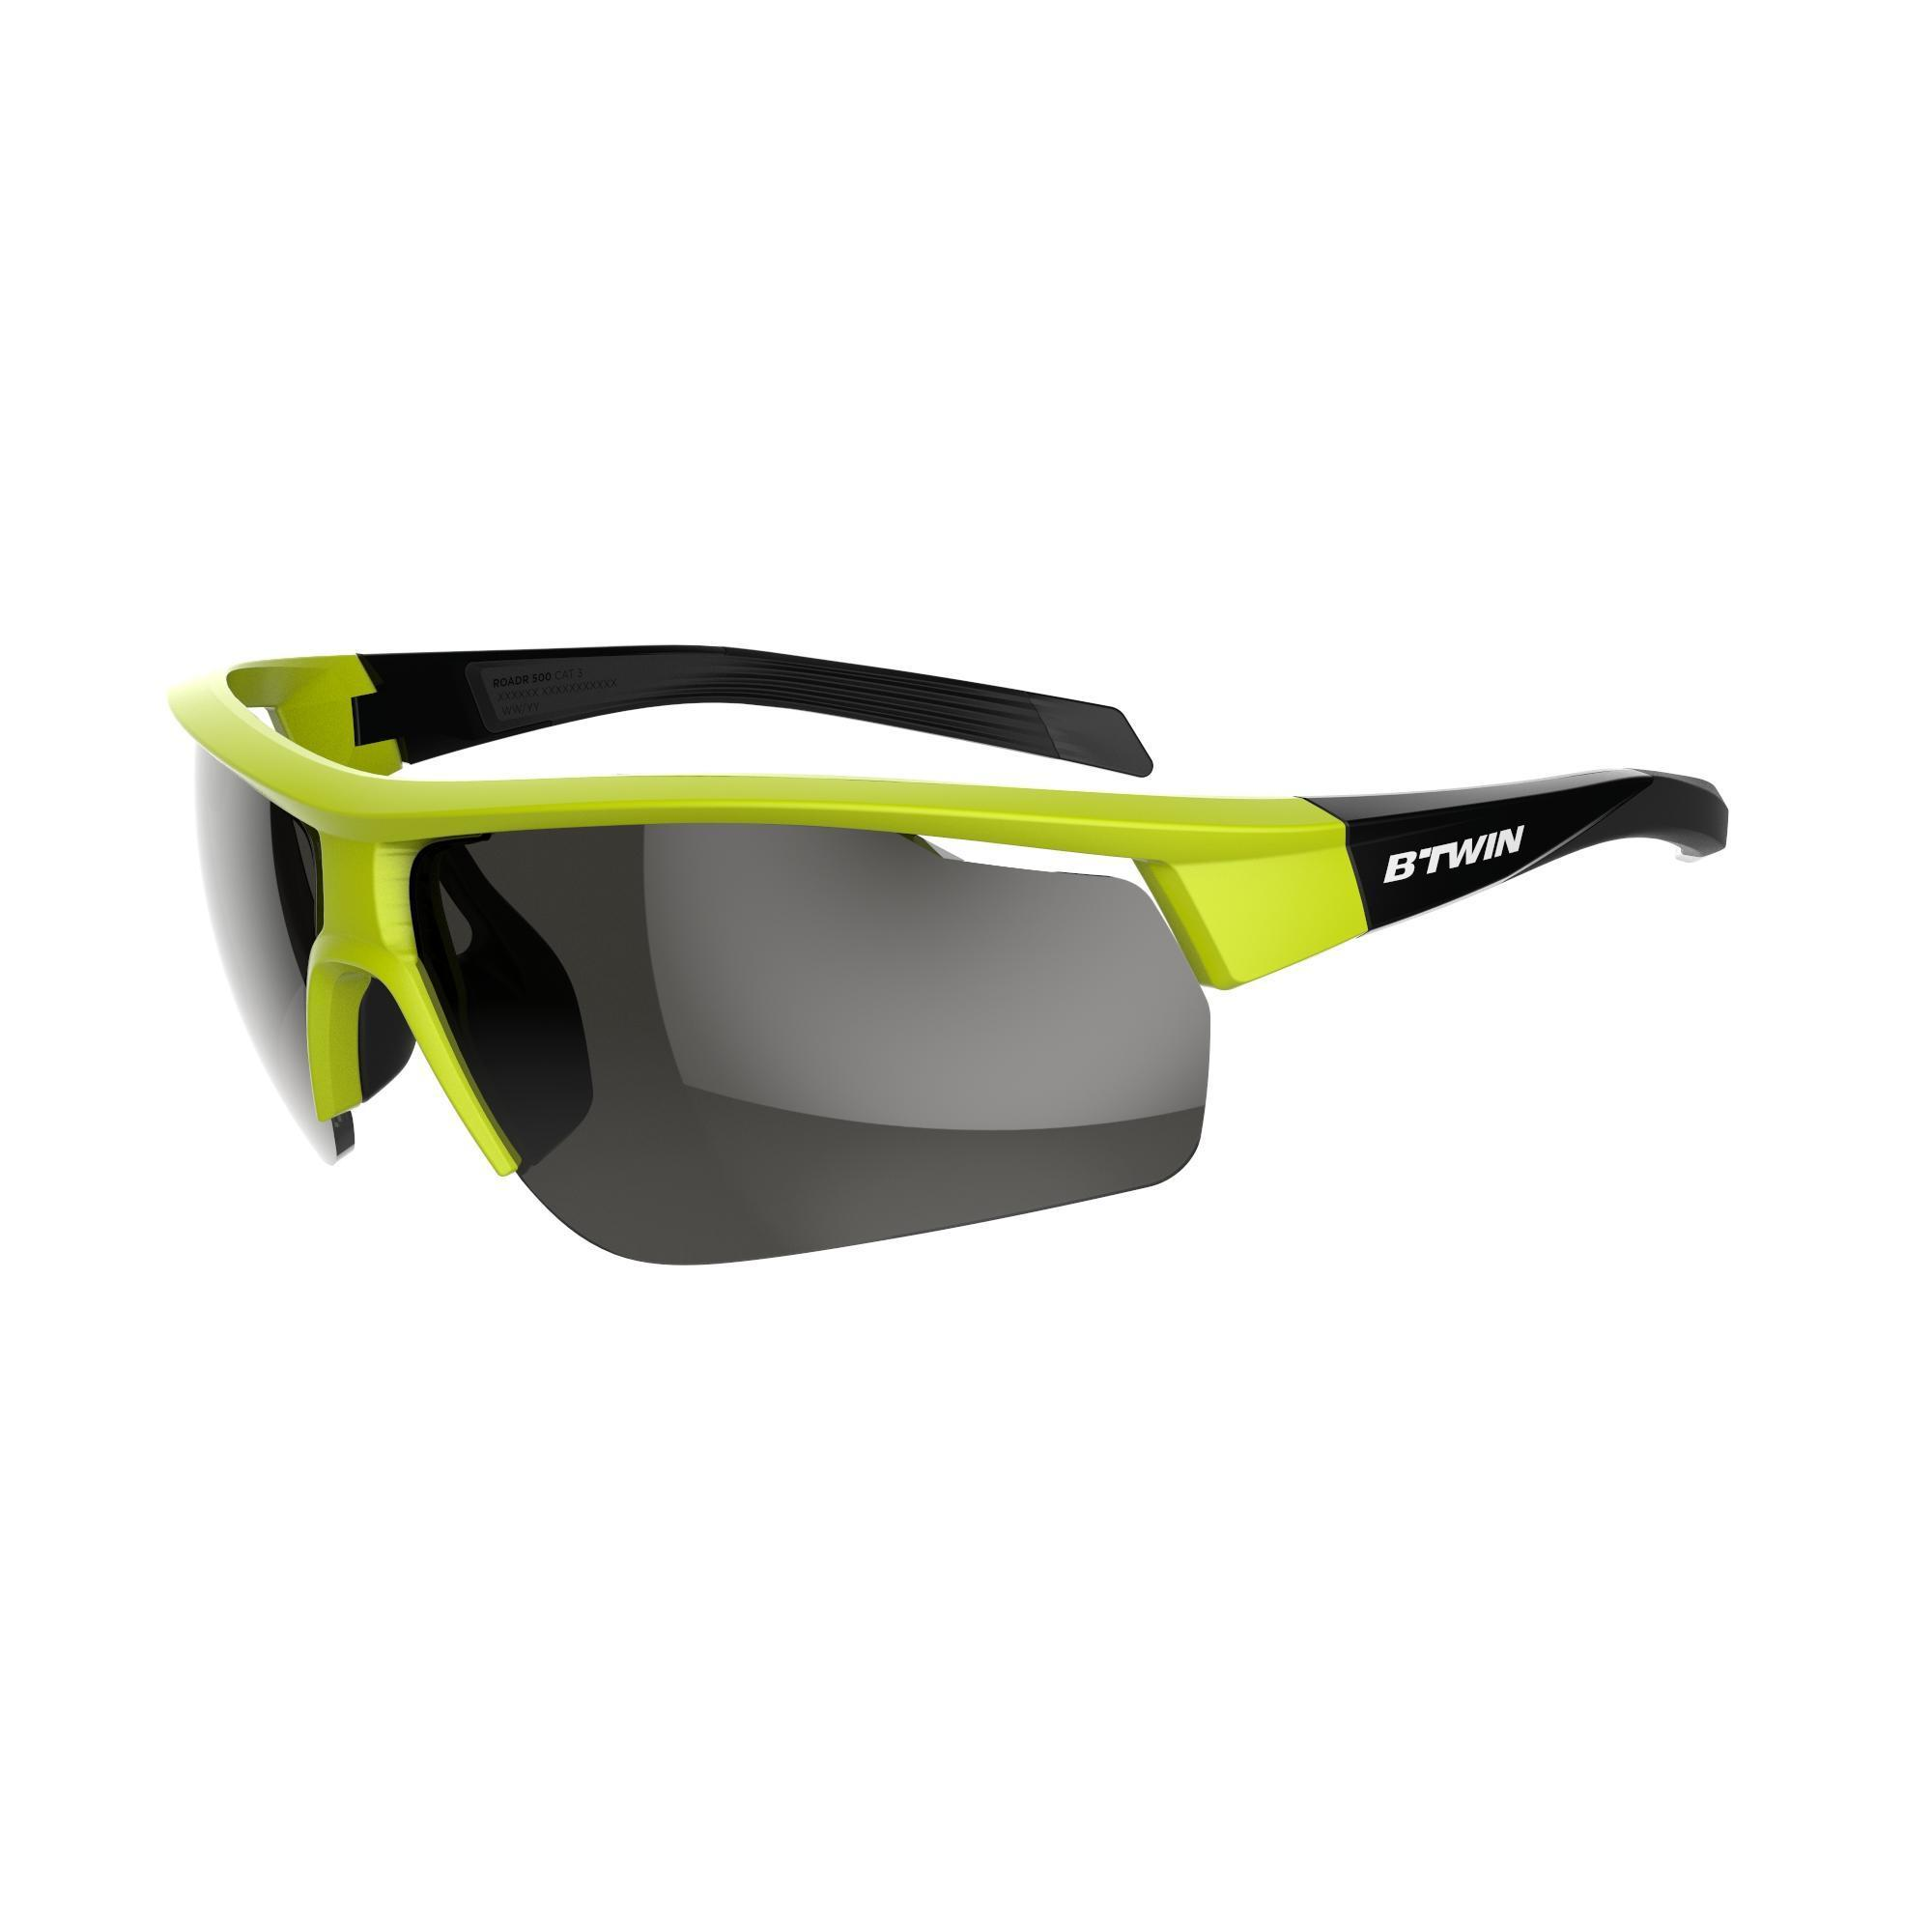 a0e9b80d20 Comprar Gafas de Ciclismo | Decathlon